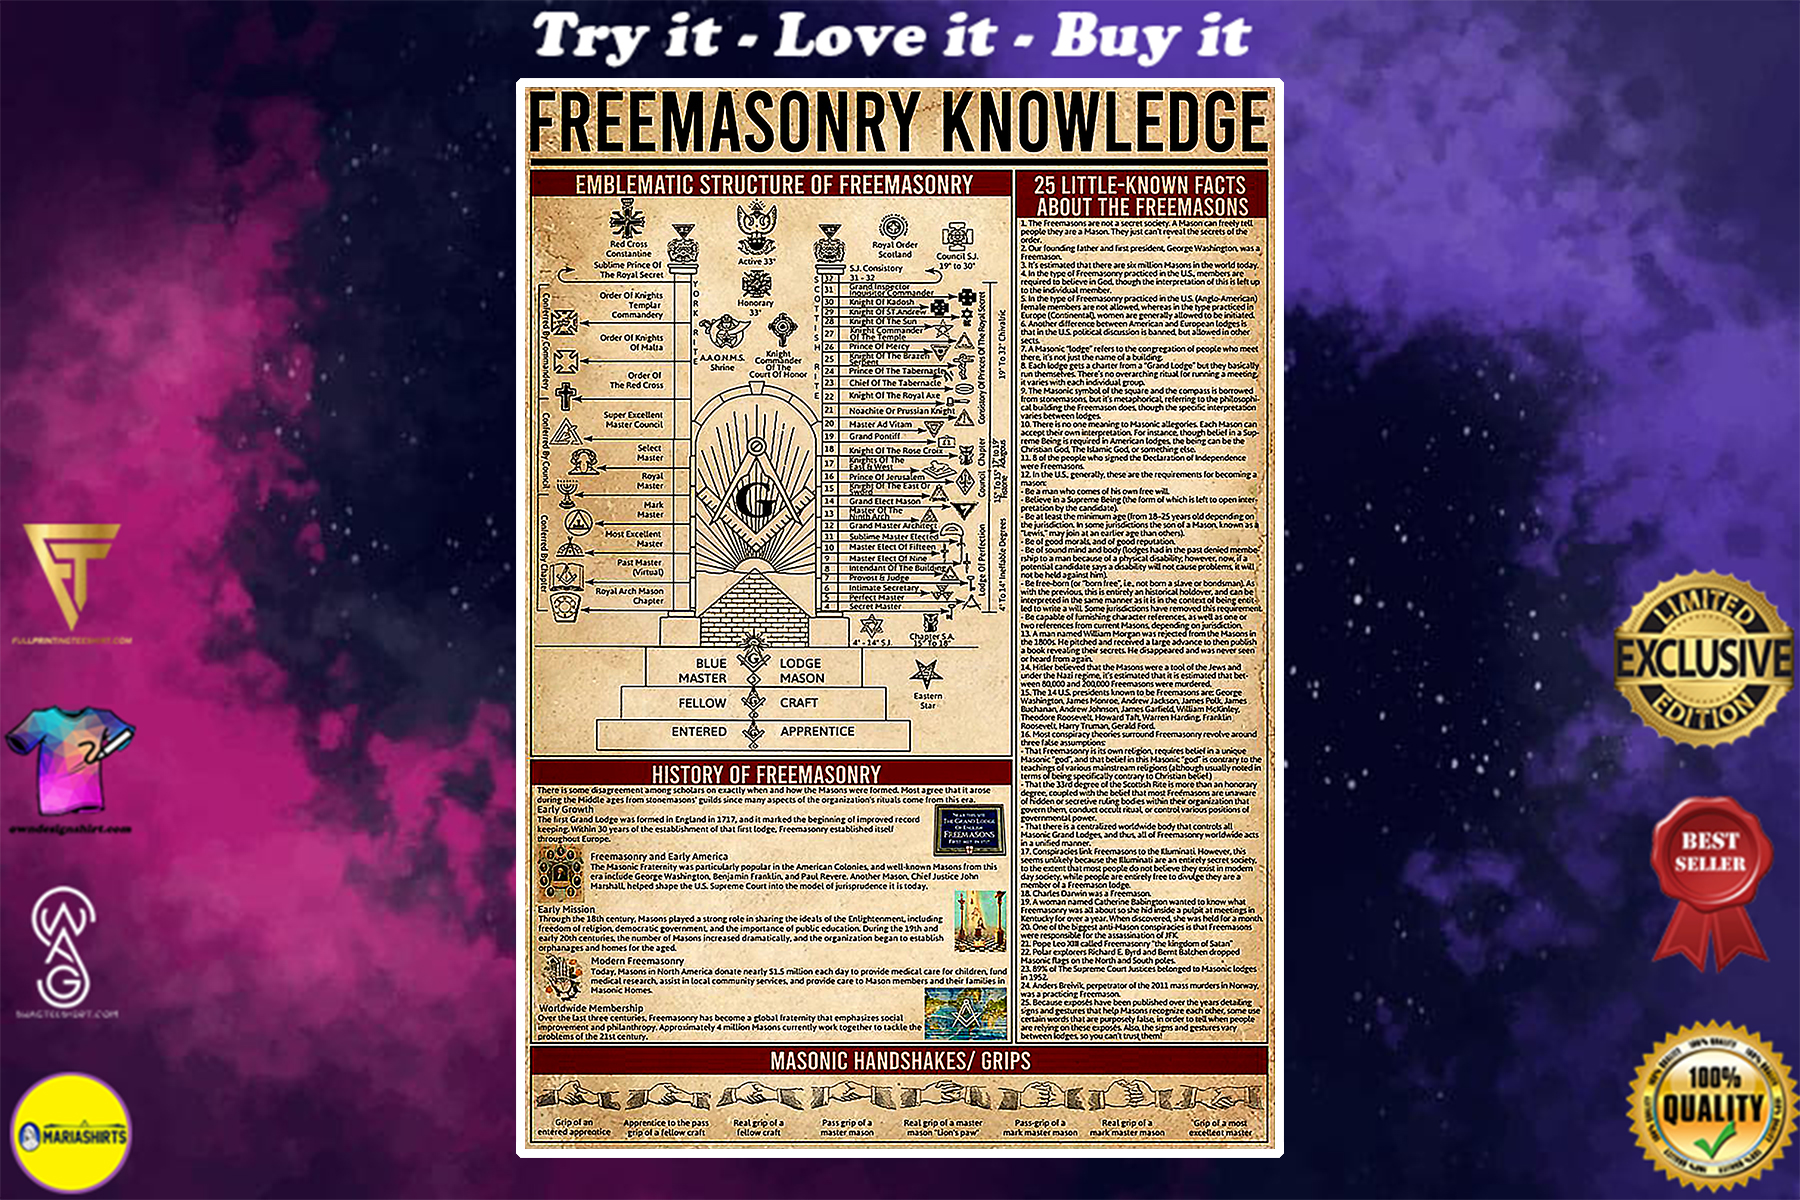 vintage freemasonry knowledge poster